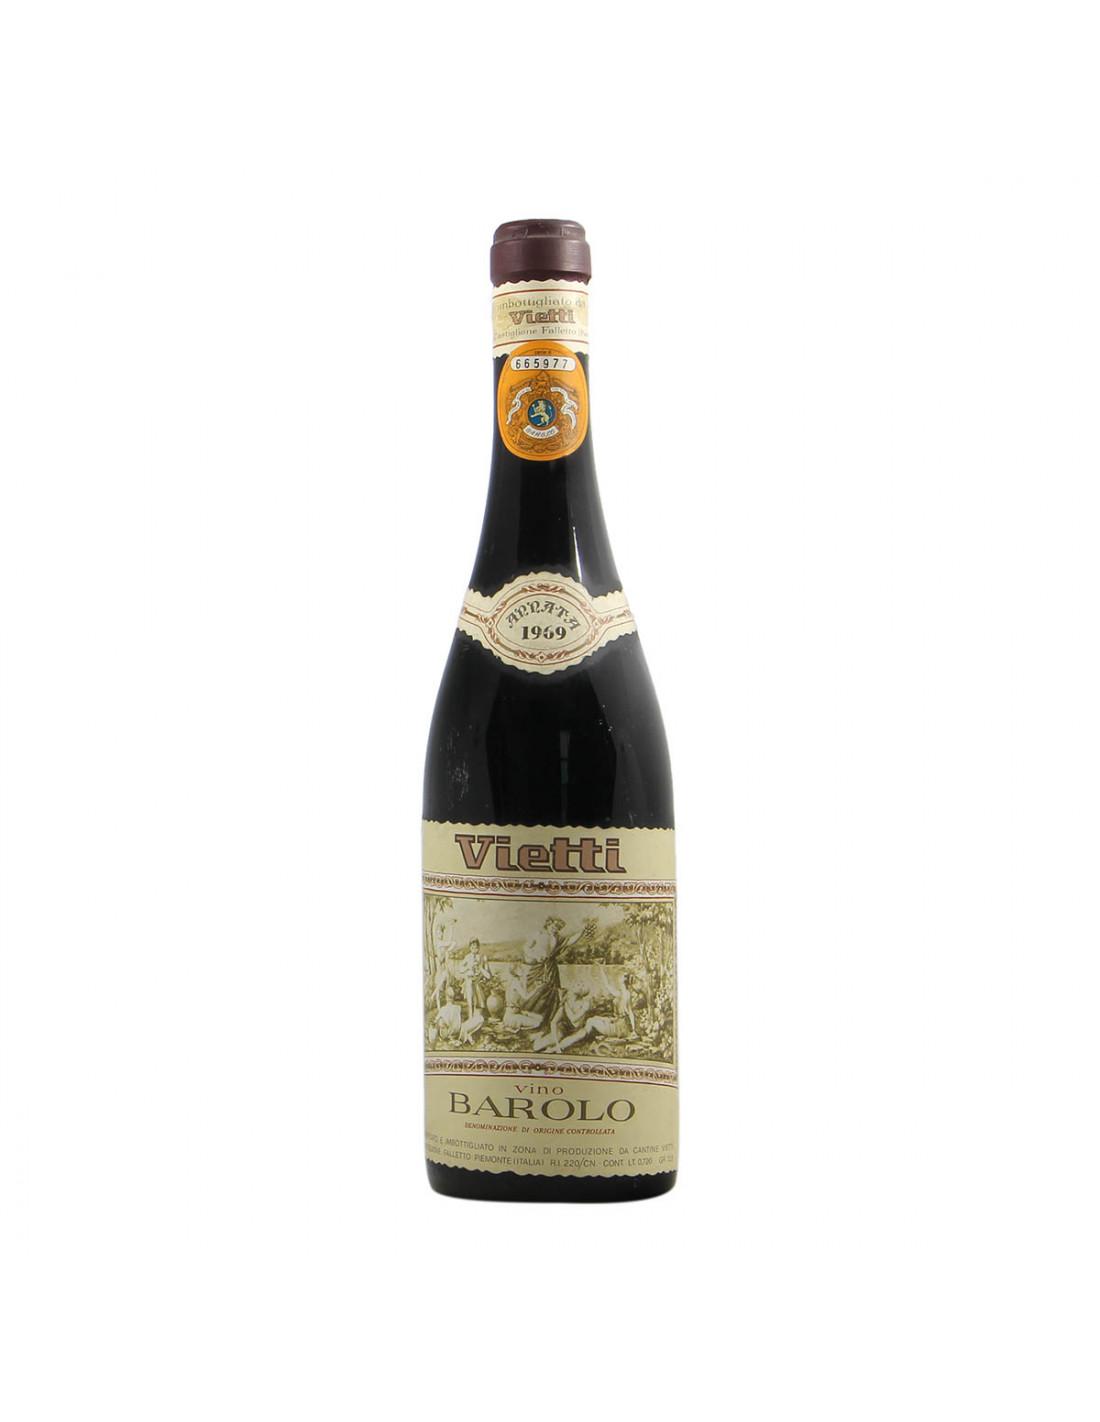 Vietti Barolo 1969 Grandi Bottiglie